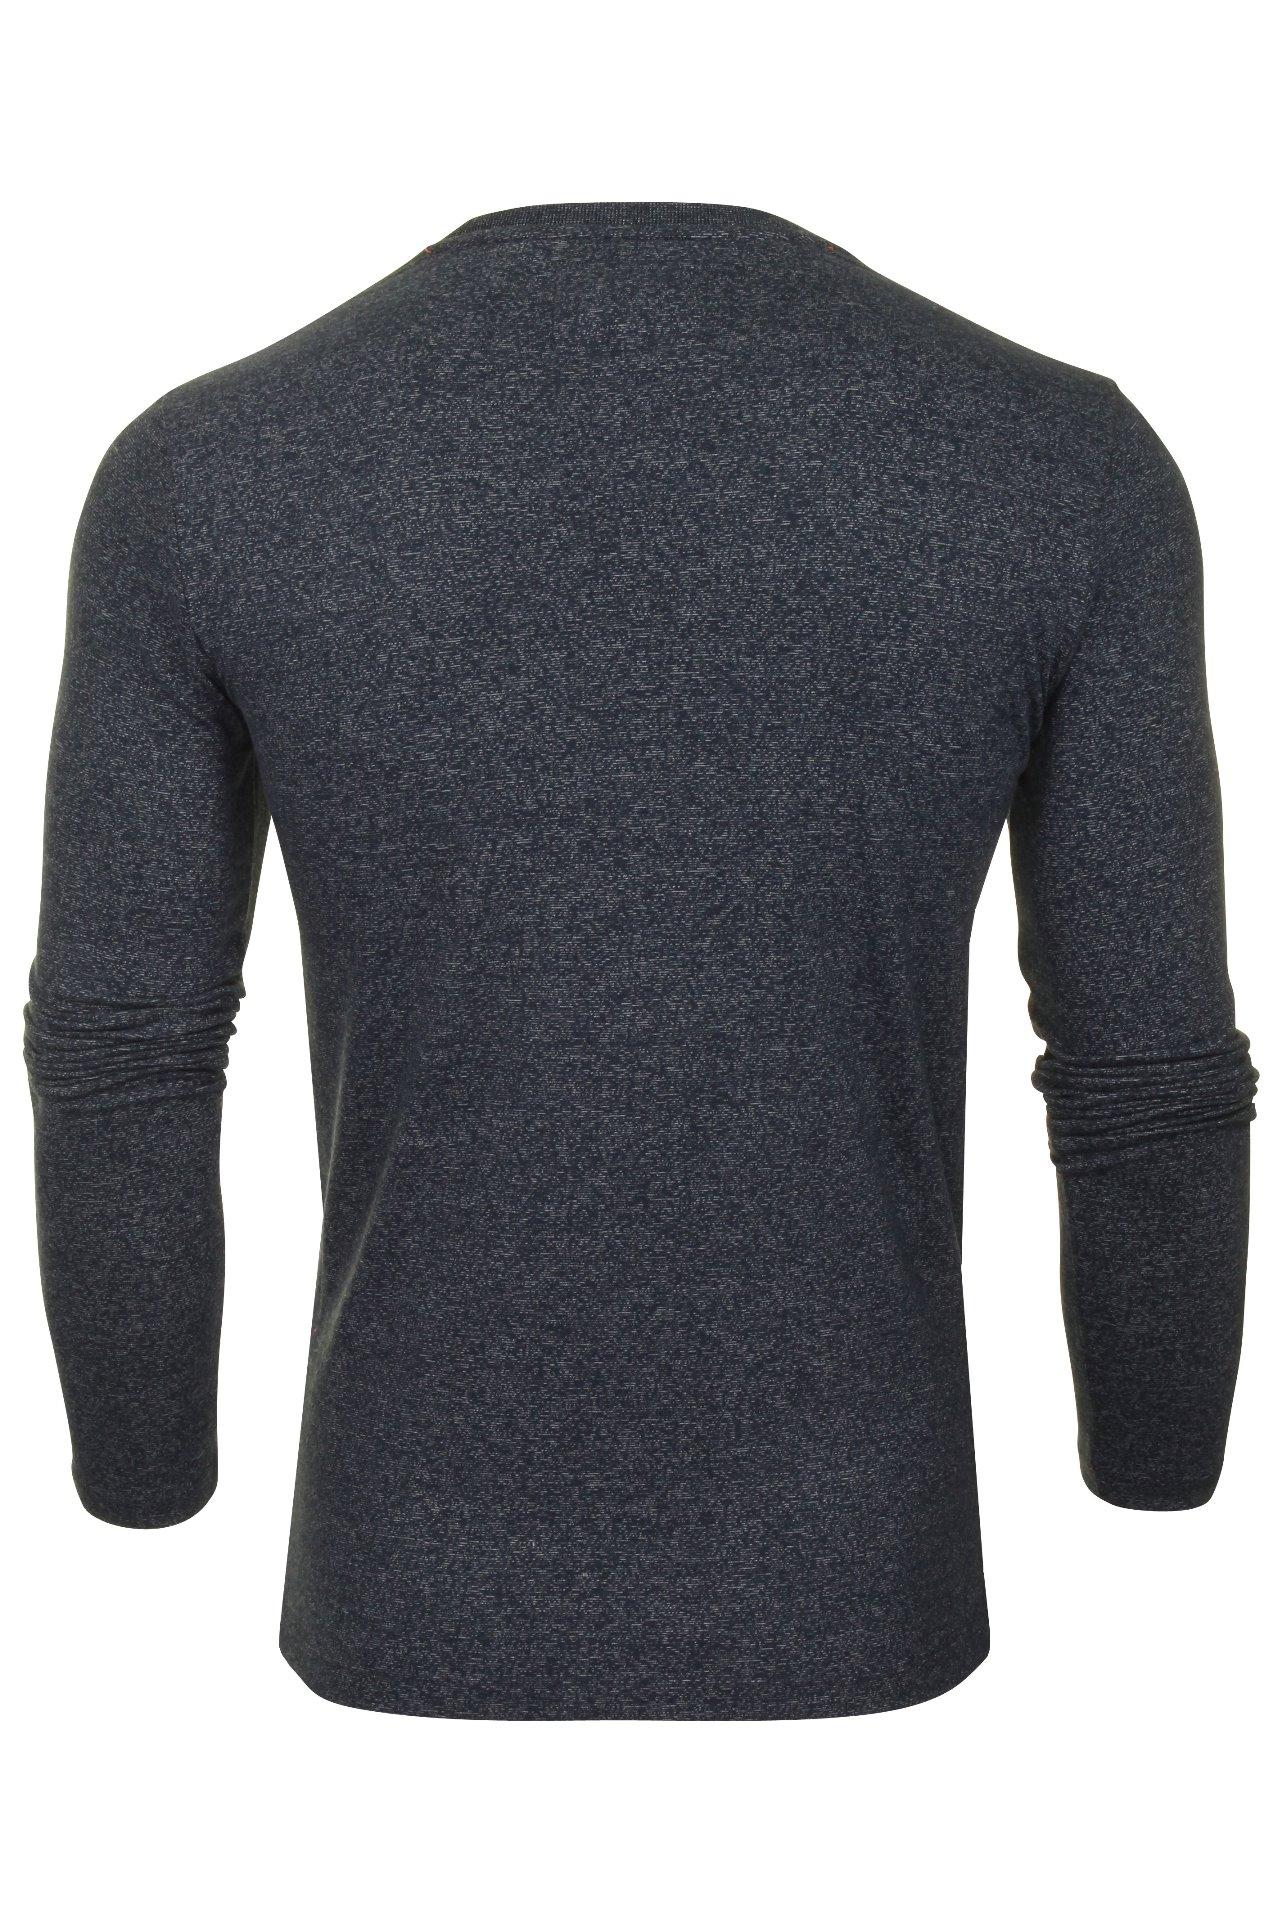 Superdry-039-Orange-Label-039-Long-Sleeved-T-Shirt thumbnail 5